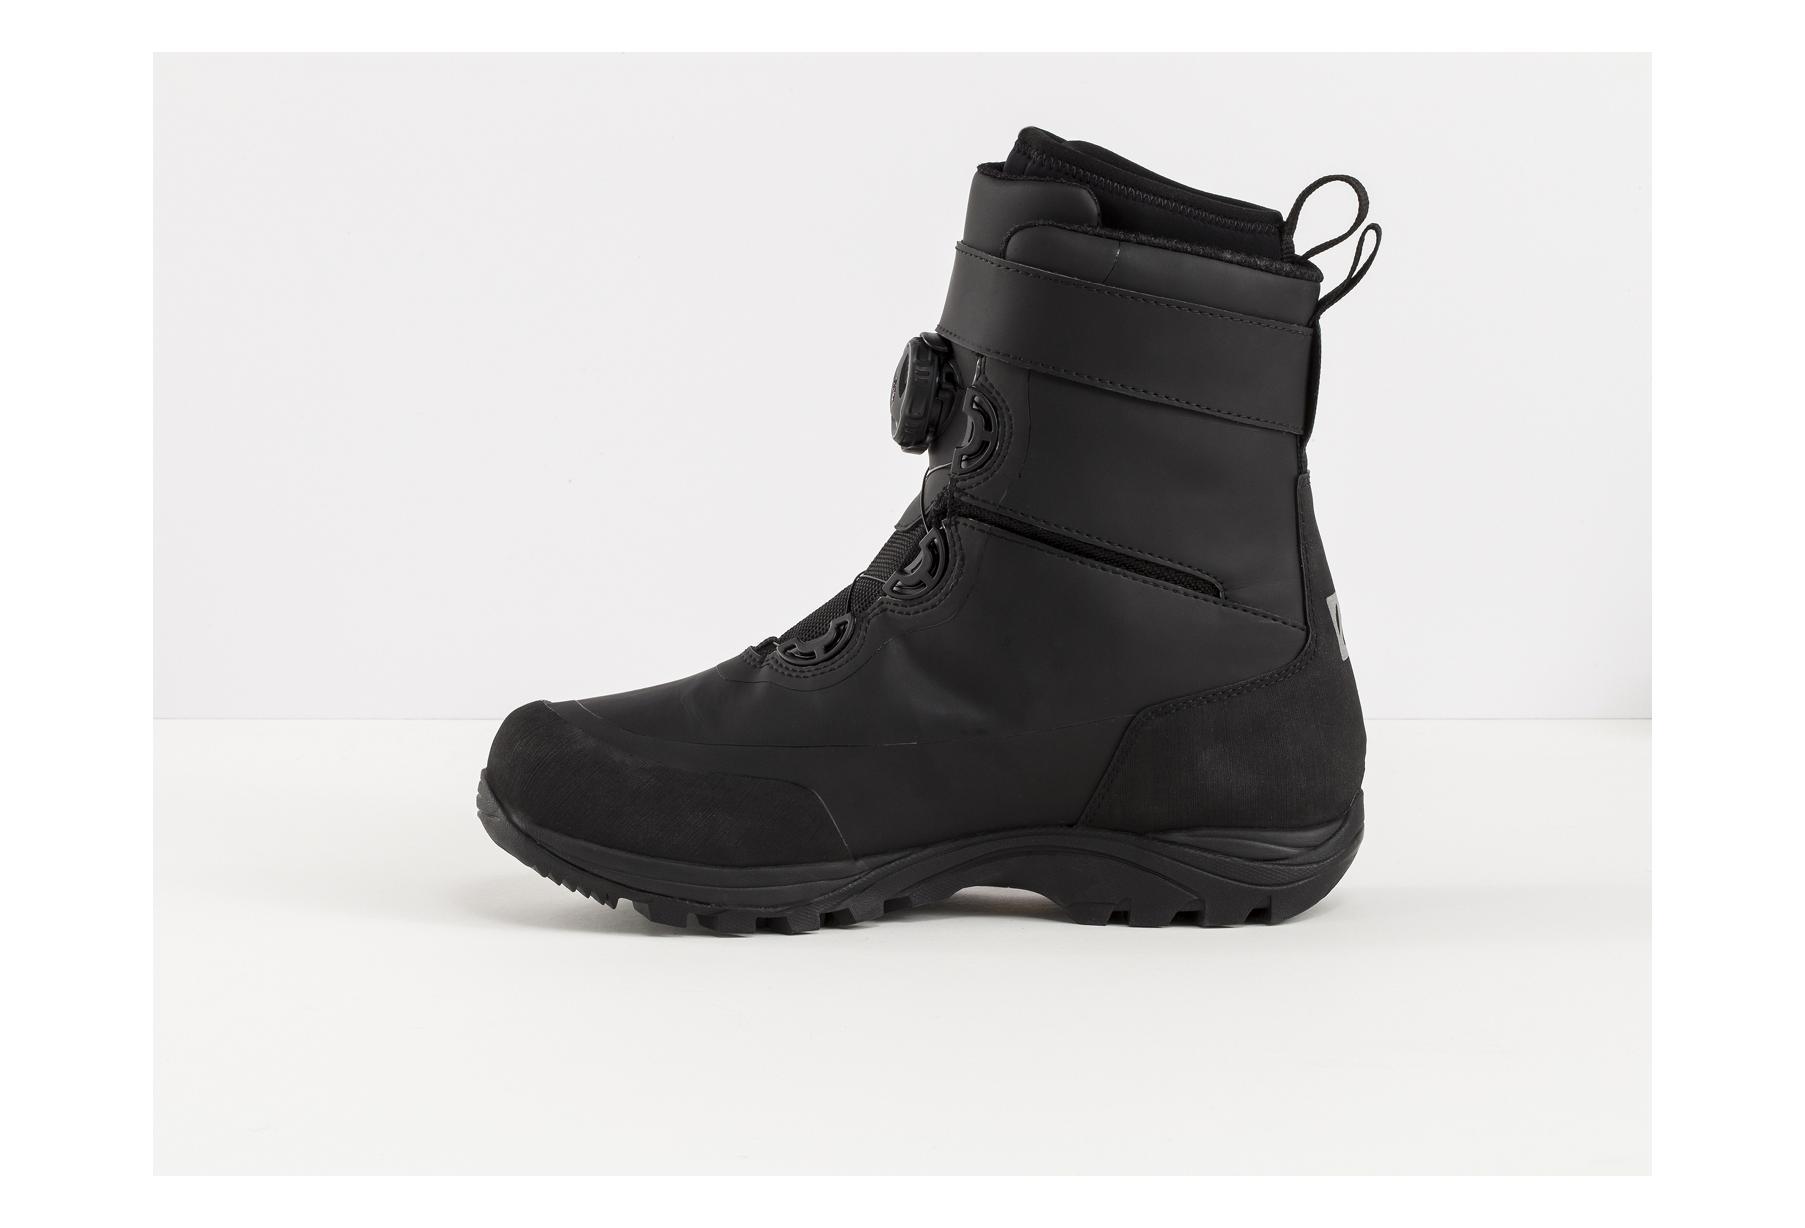 Bontrager Winter Shoes OMW Black 2019